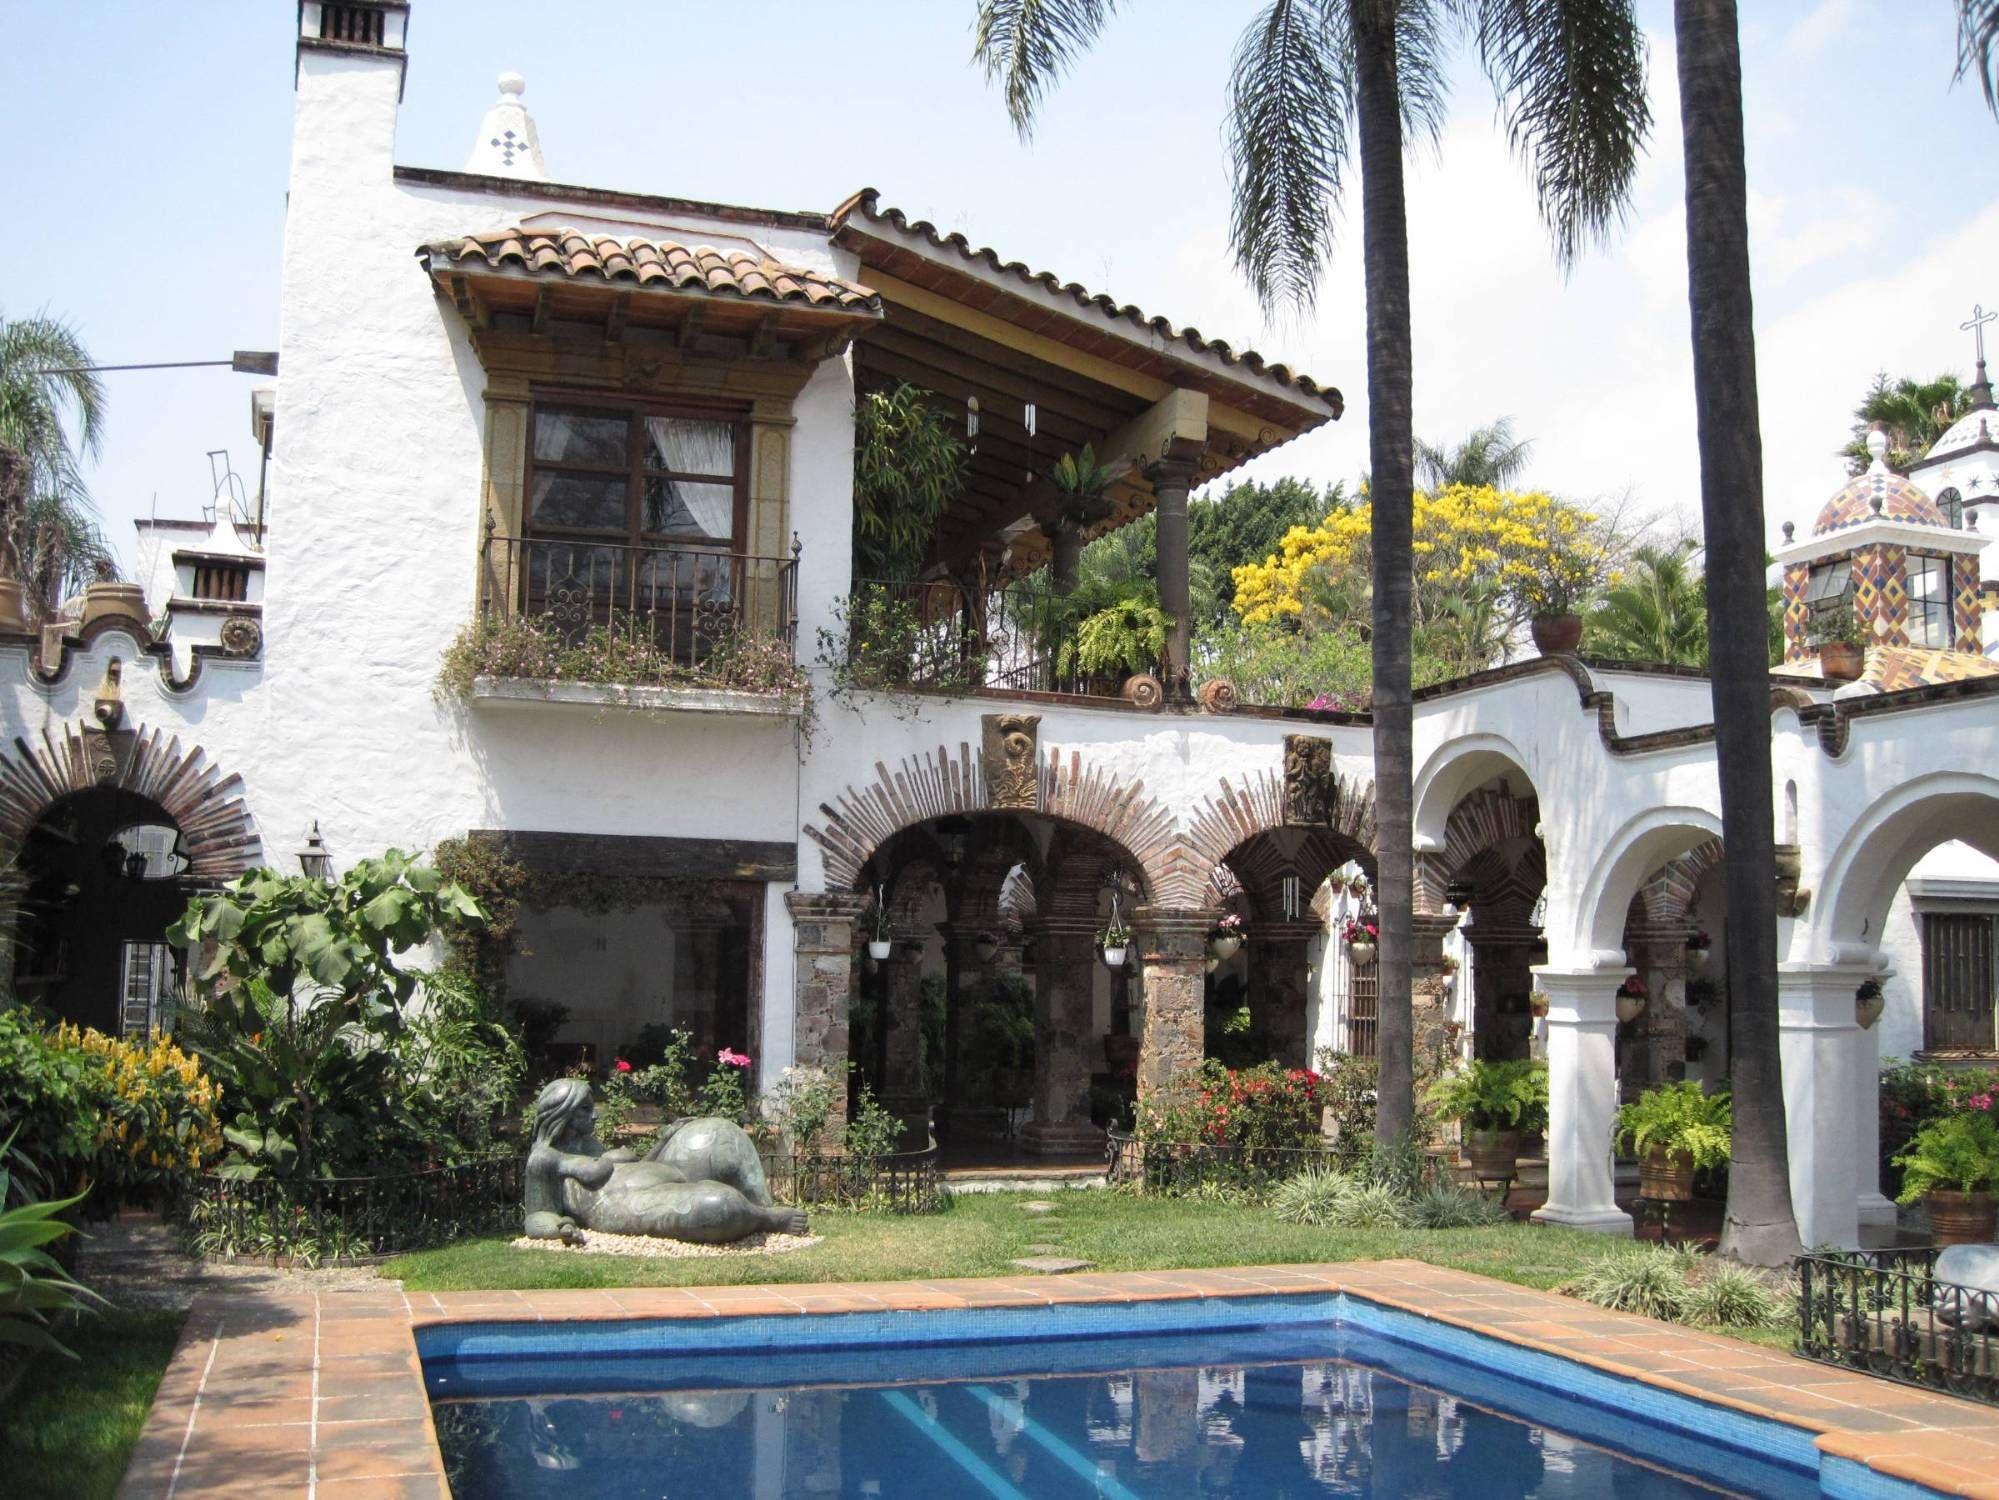 Casas estilo colonial mexicanas pesquisa google for Fachadas de casas mexicanas rusticas